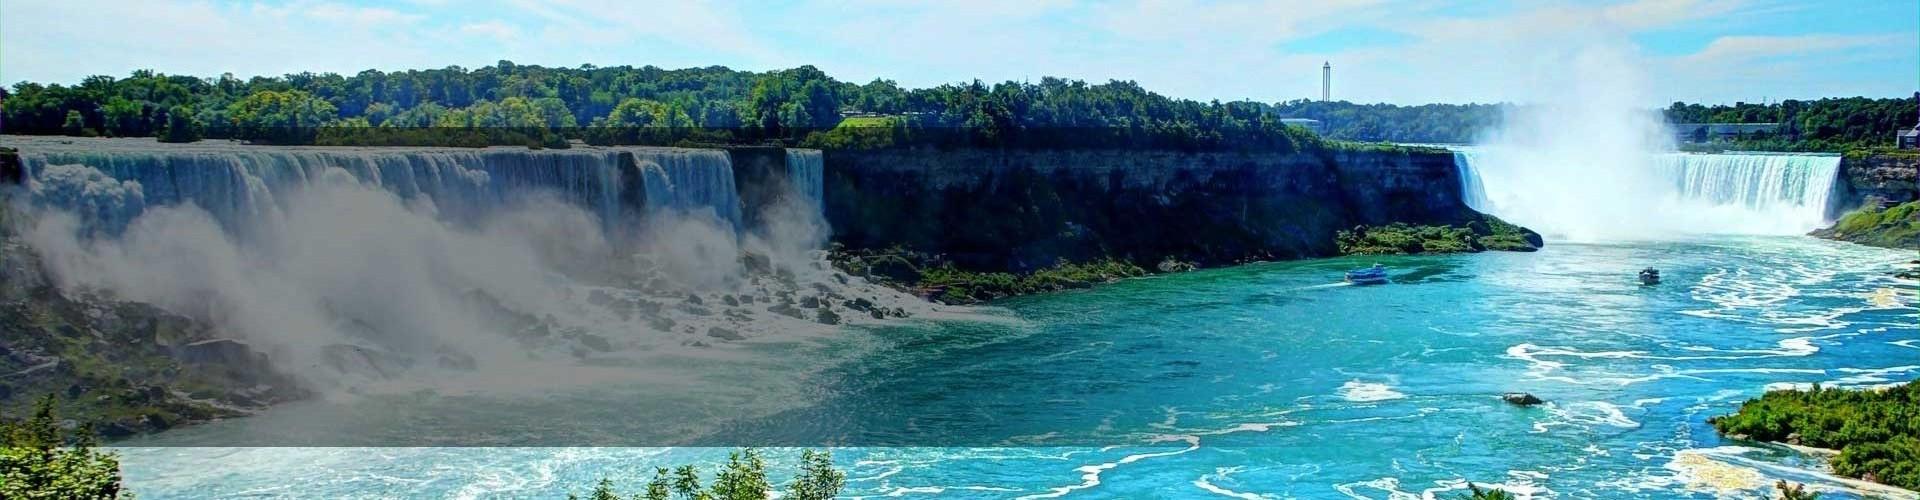 Niagara River Drift Diving